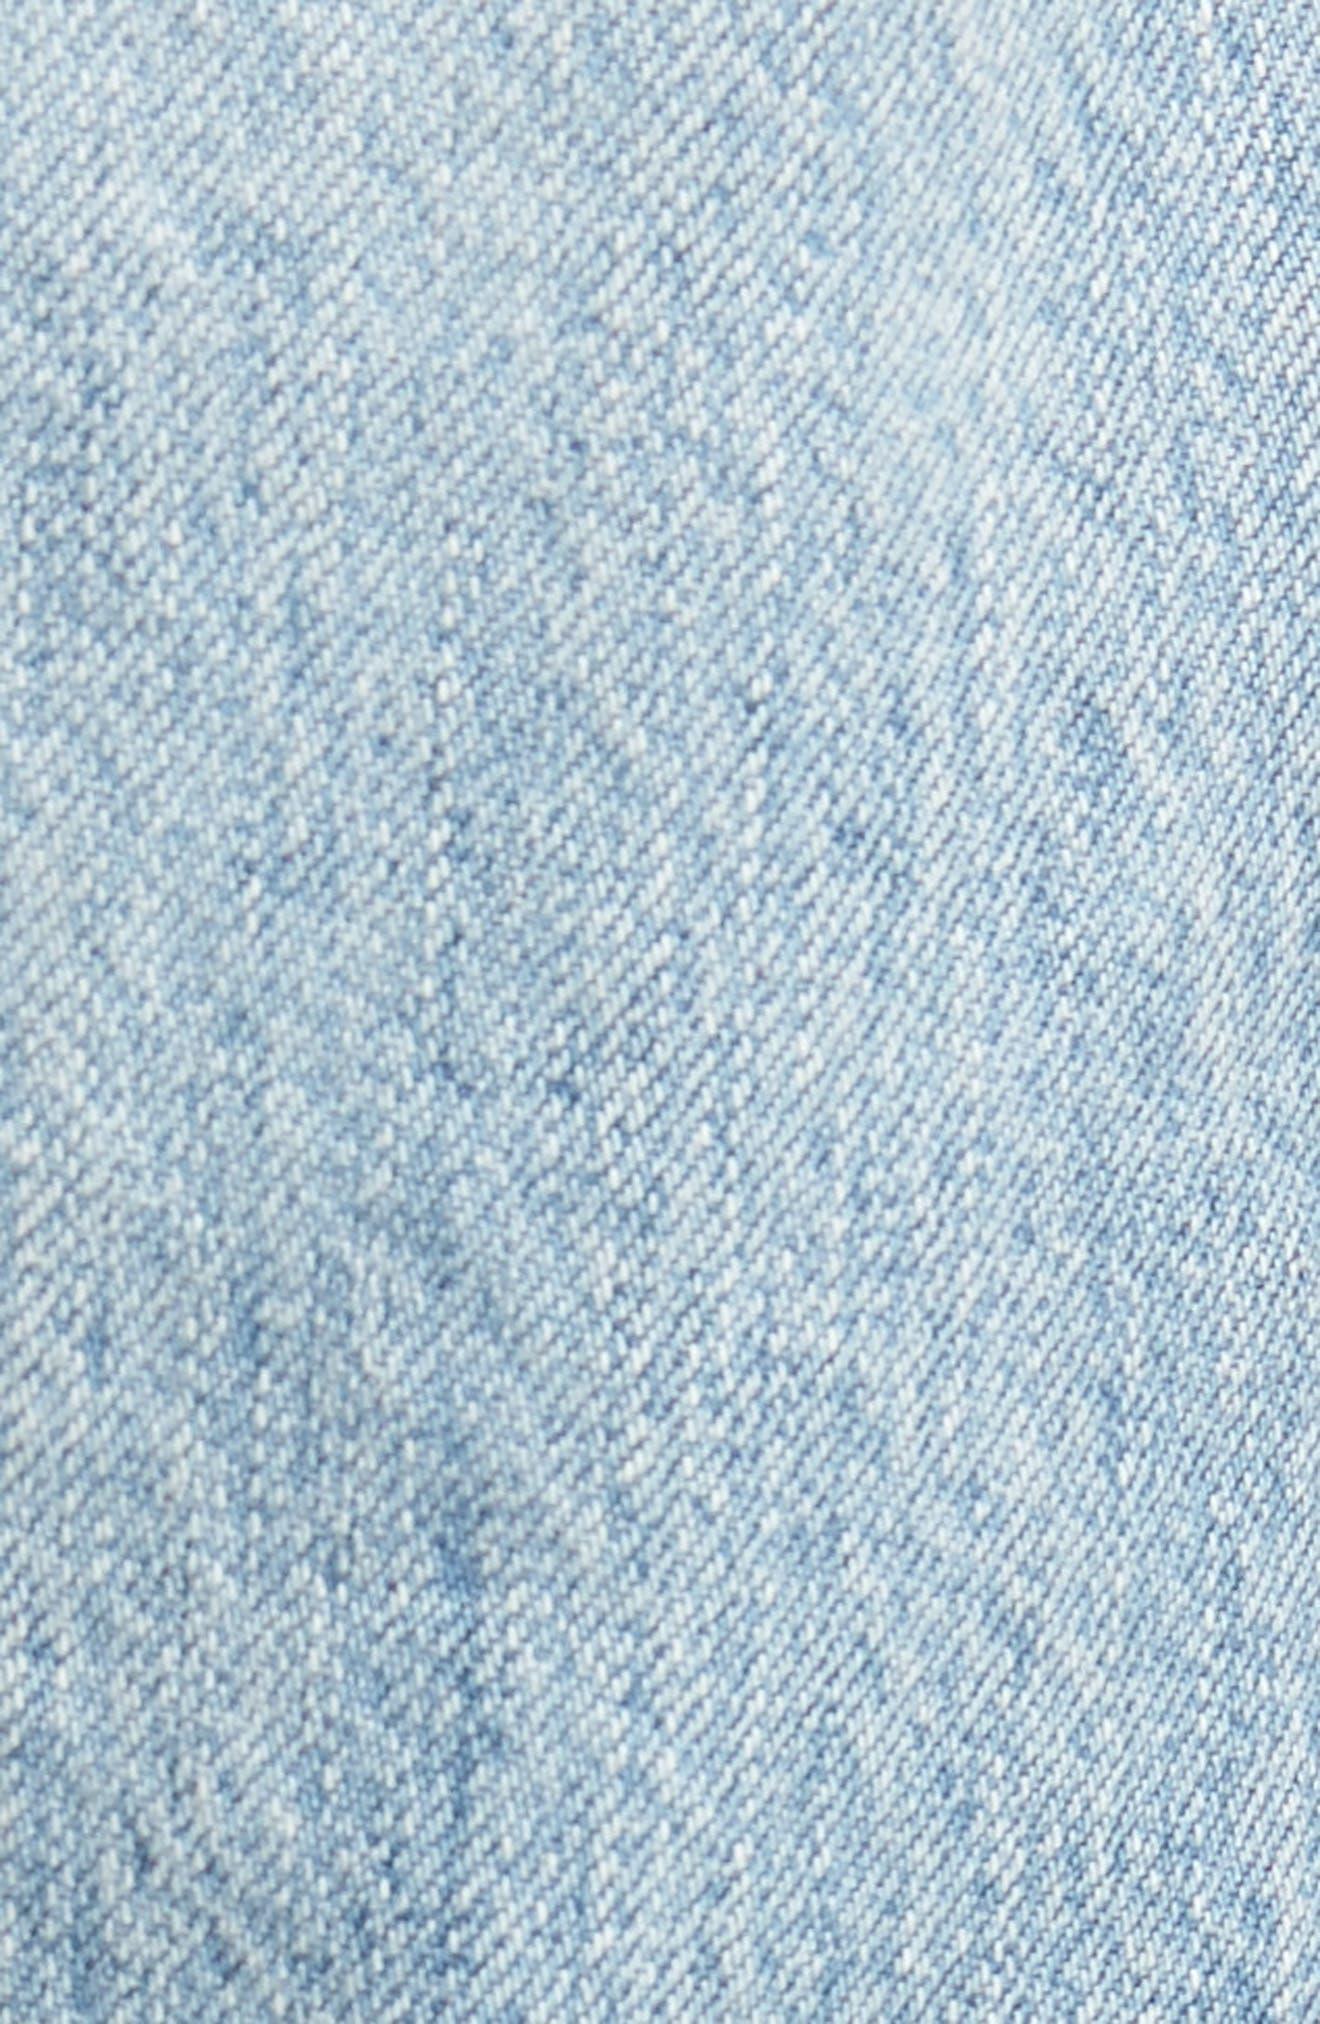 Tellis Slim Fit Jeans,                             Alternate thumbnail 5, color,                             494